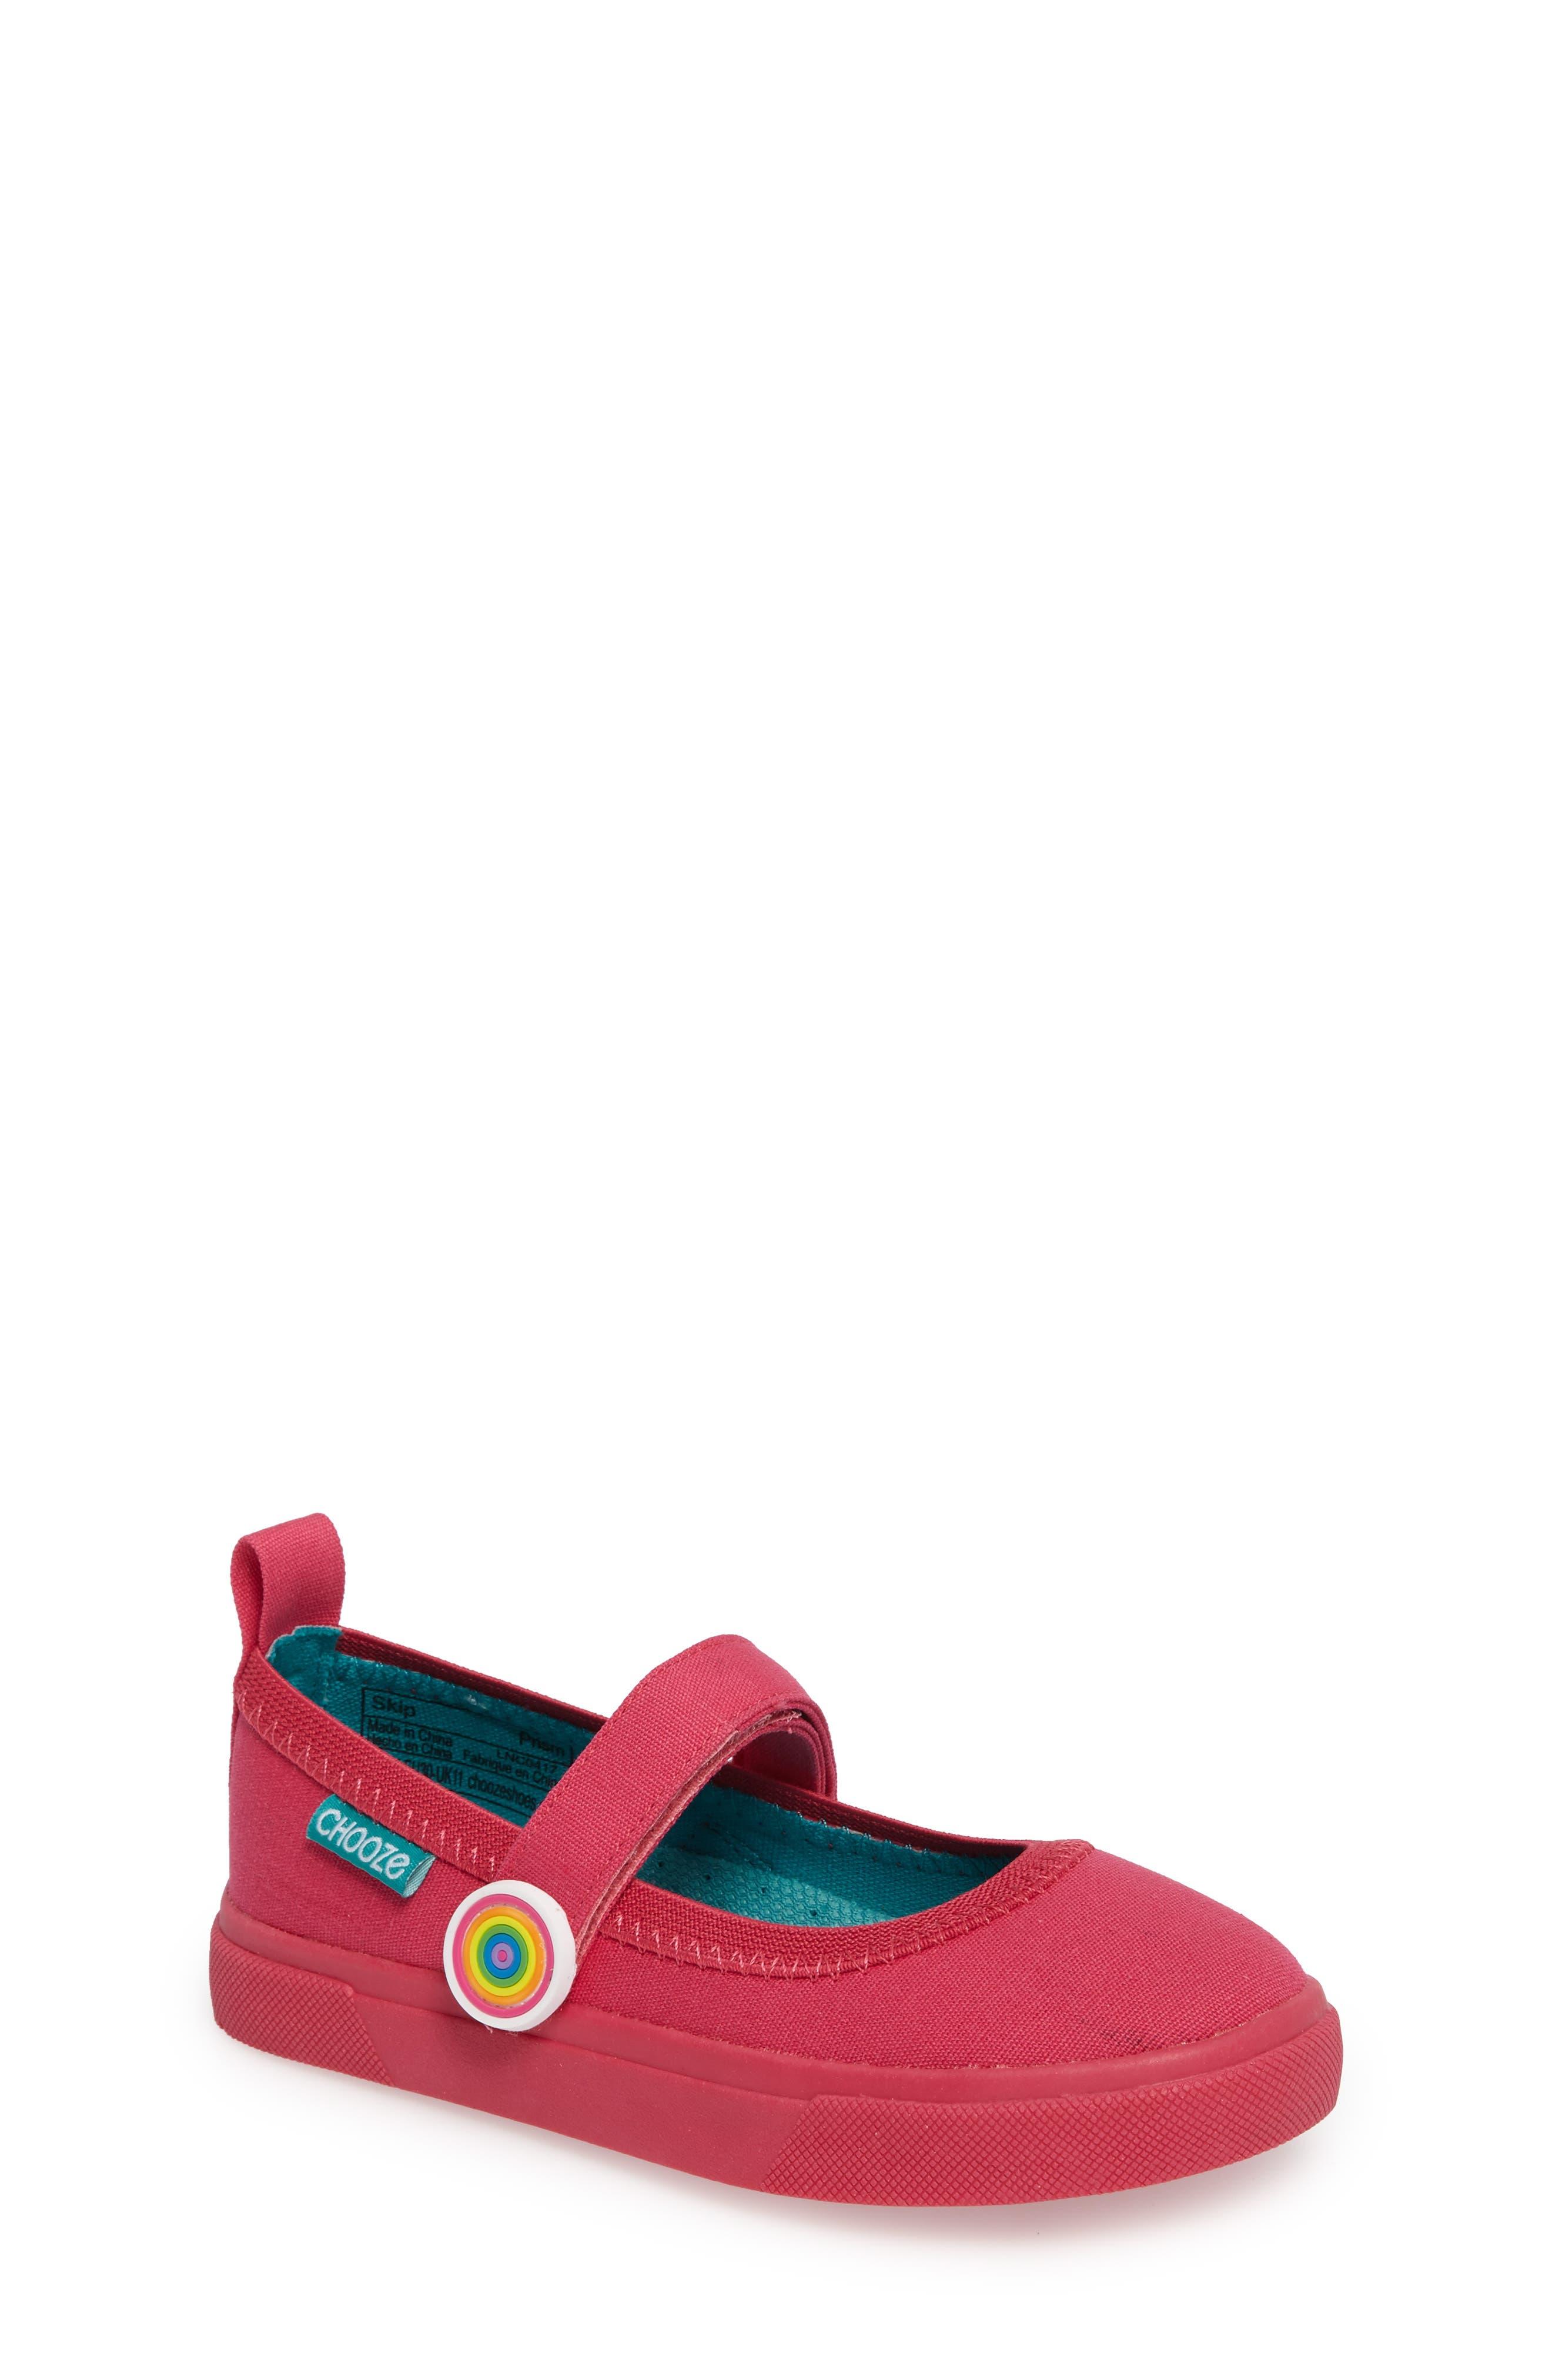 Skip Mary Jane Sneaker,                             Main thumbnail 1, color,                             Prism